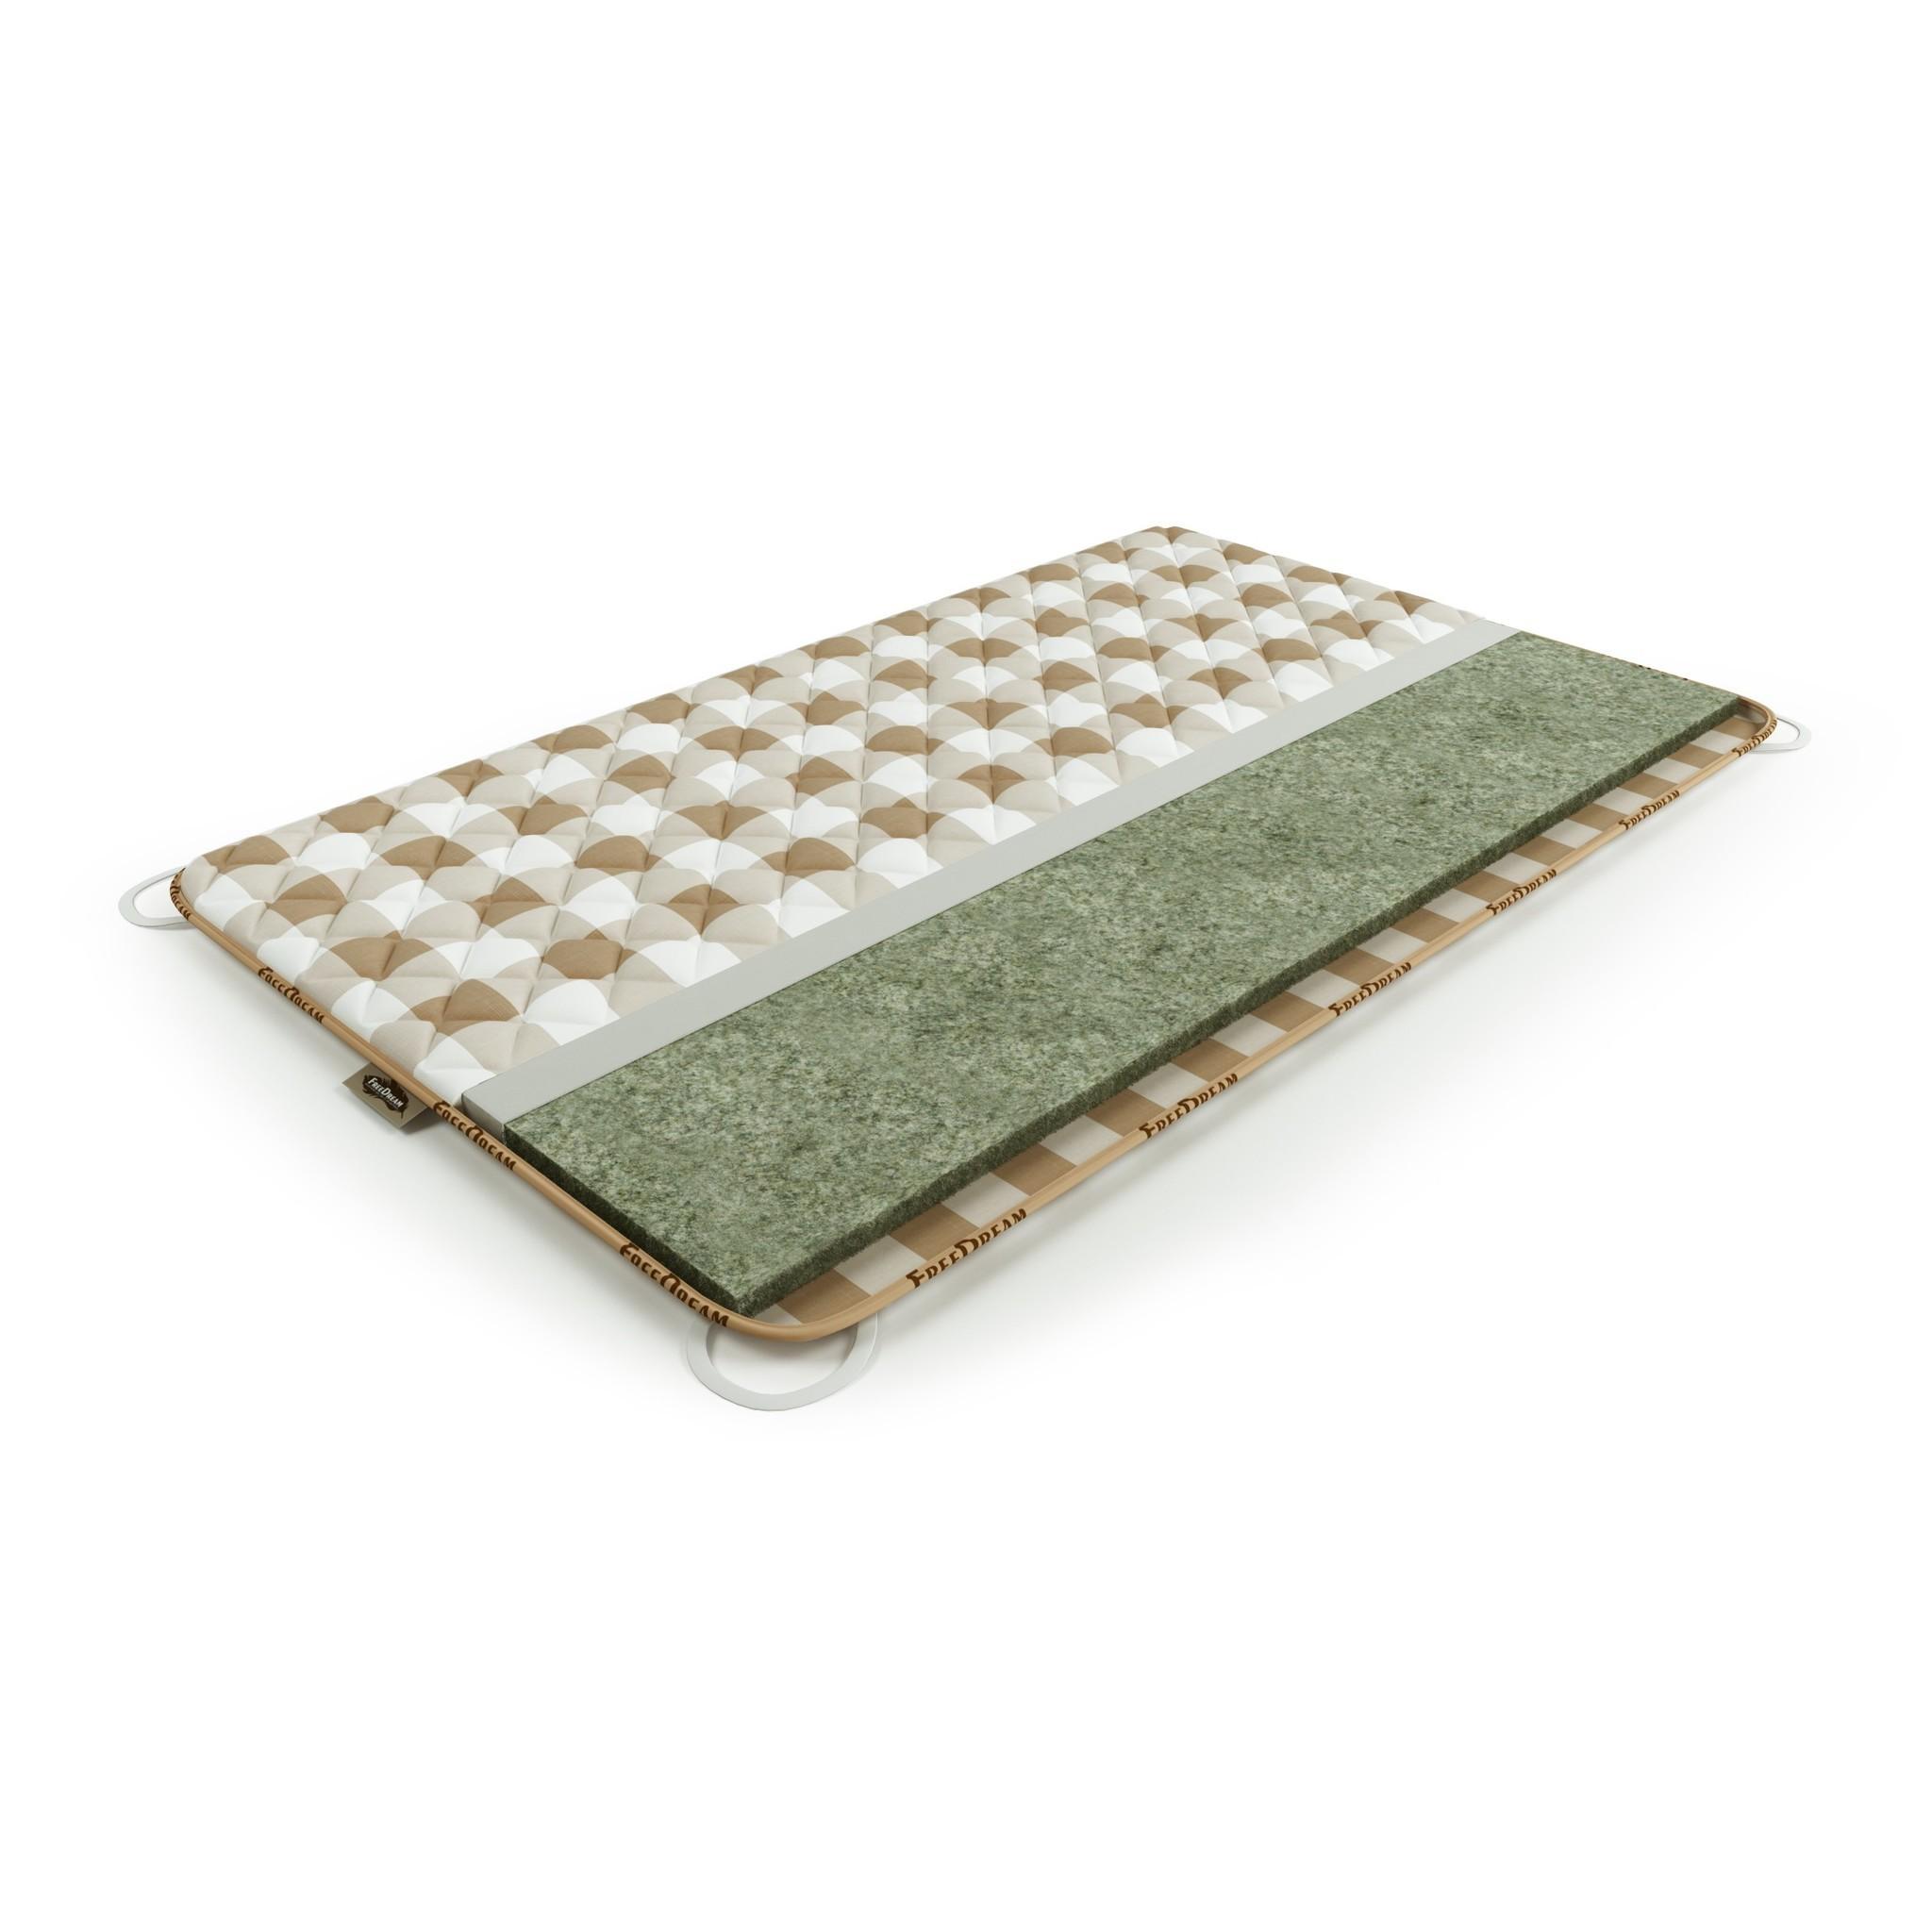 Наматрасник Mr. Mattress Linen L (110x190)